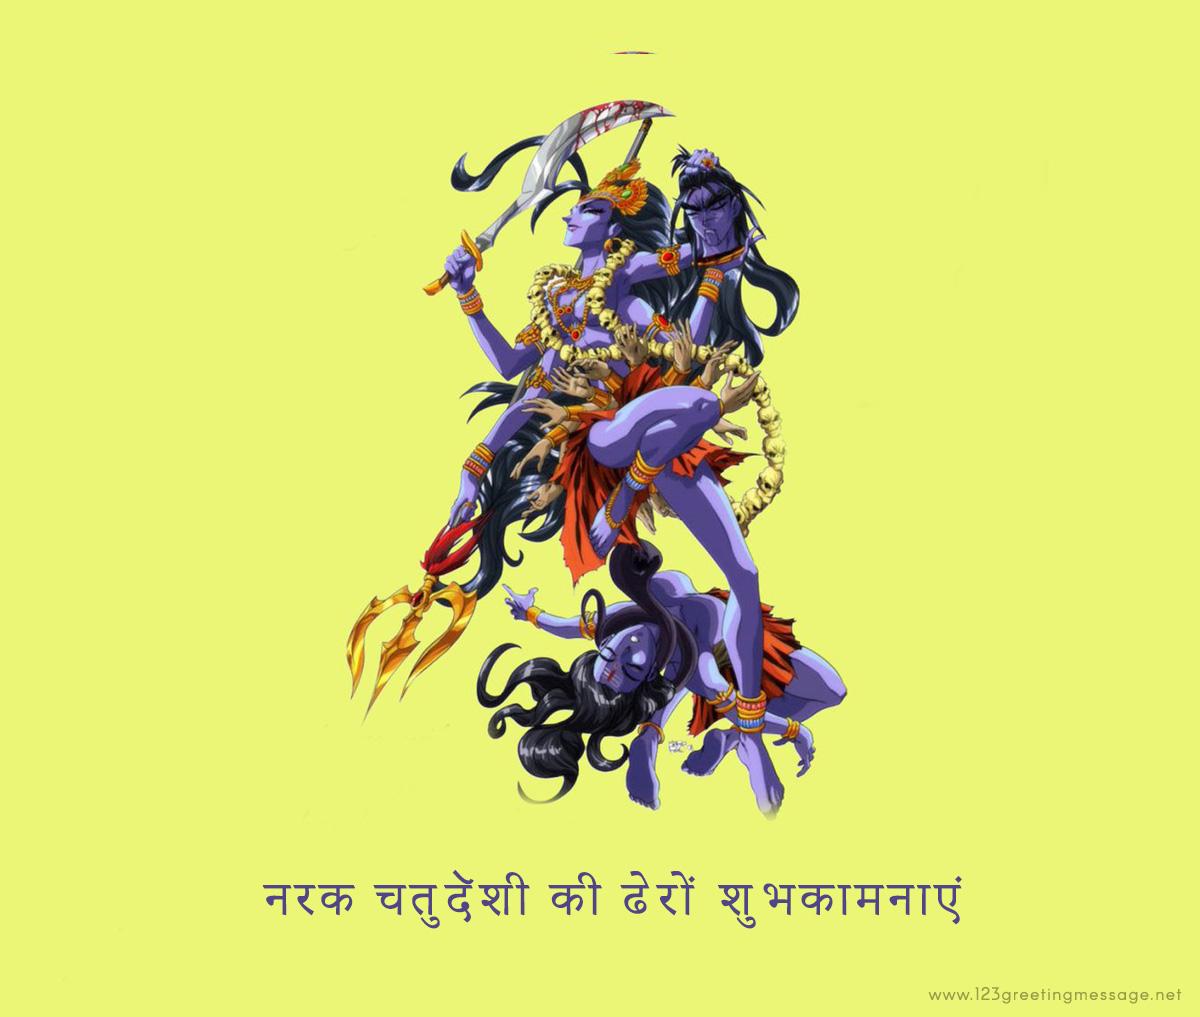 Kali Narak Chaturdashi Wishes